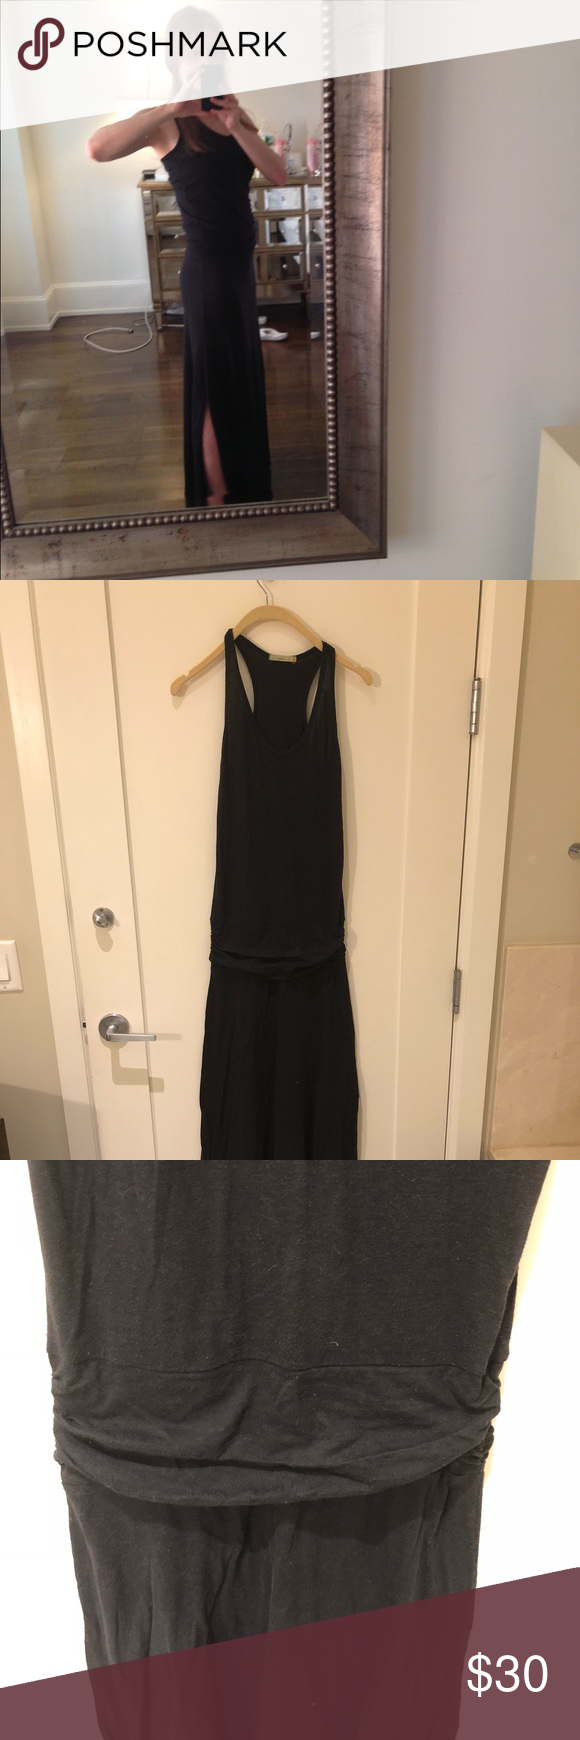 Alternative Apparel Black Racerback Maxi Dress Long Black Dress With Folded Band Around Waist Racerb Racerback Maxi Dress Alternative Outfits Long Black Dress [ 1740 x 580 Pixel ]